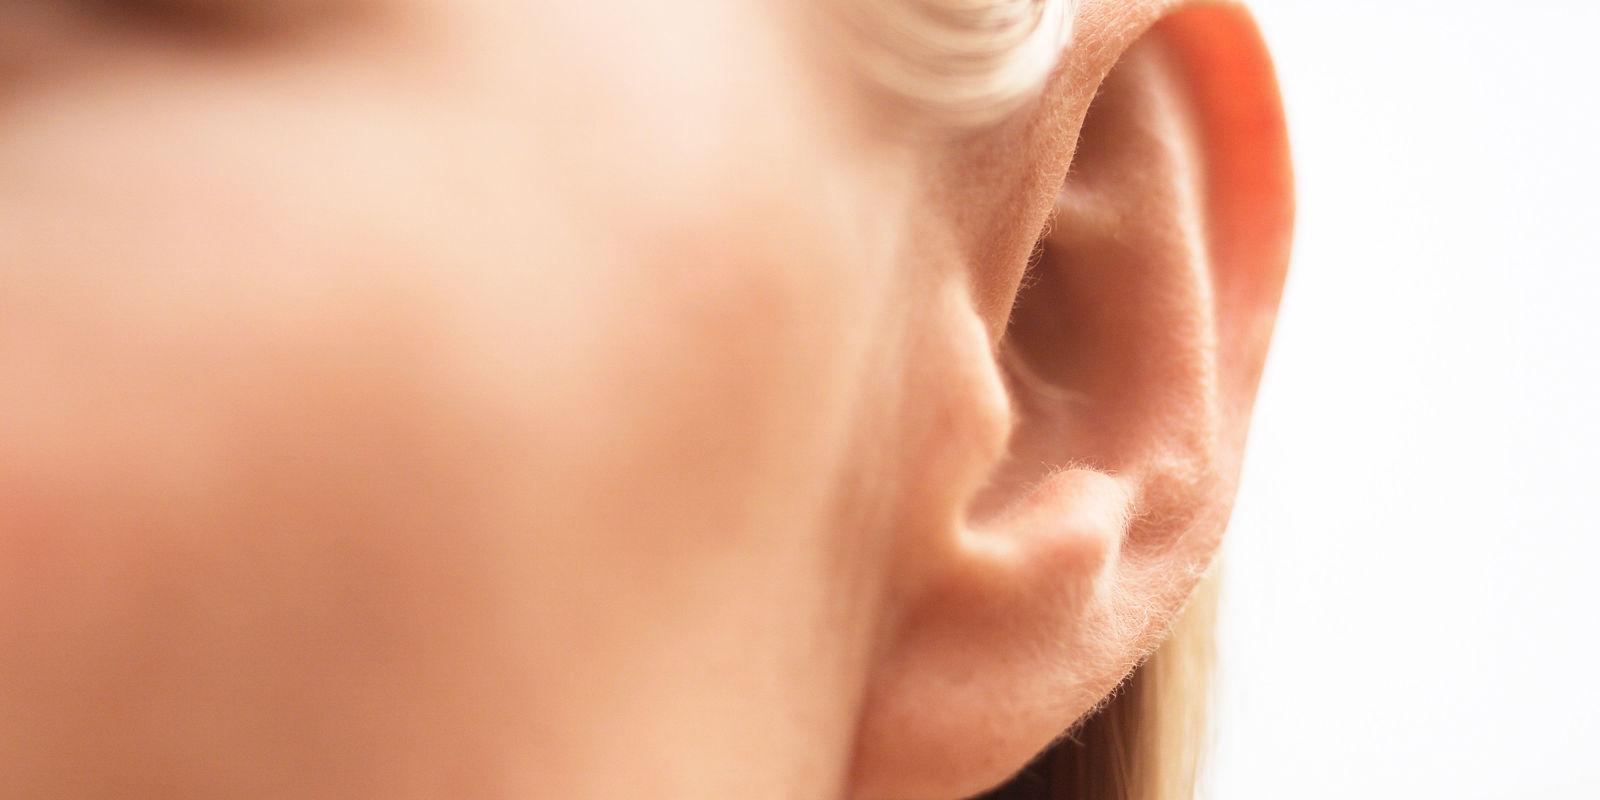 Ears Eyes Nose Throat Doctor 72